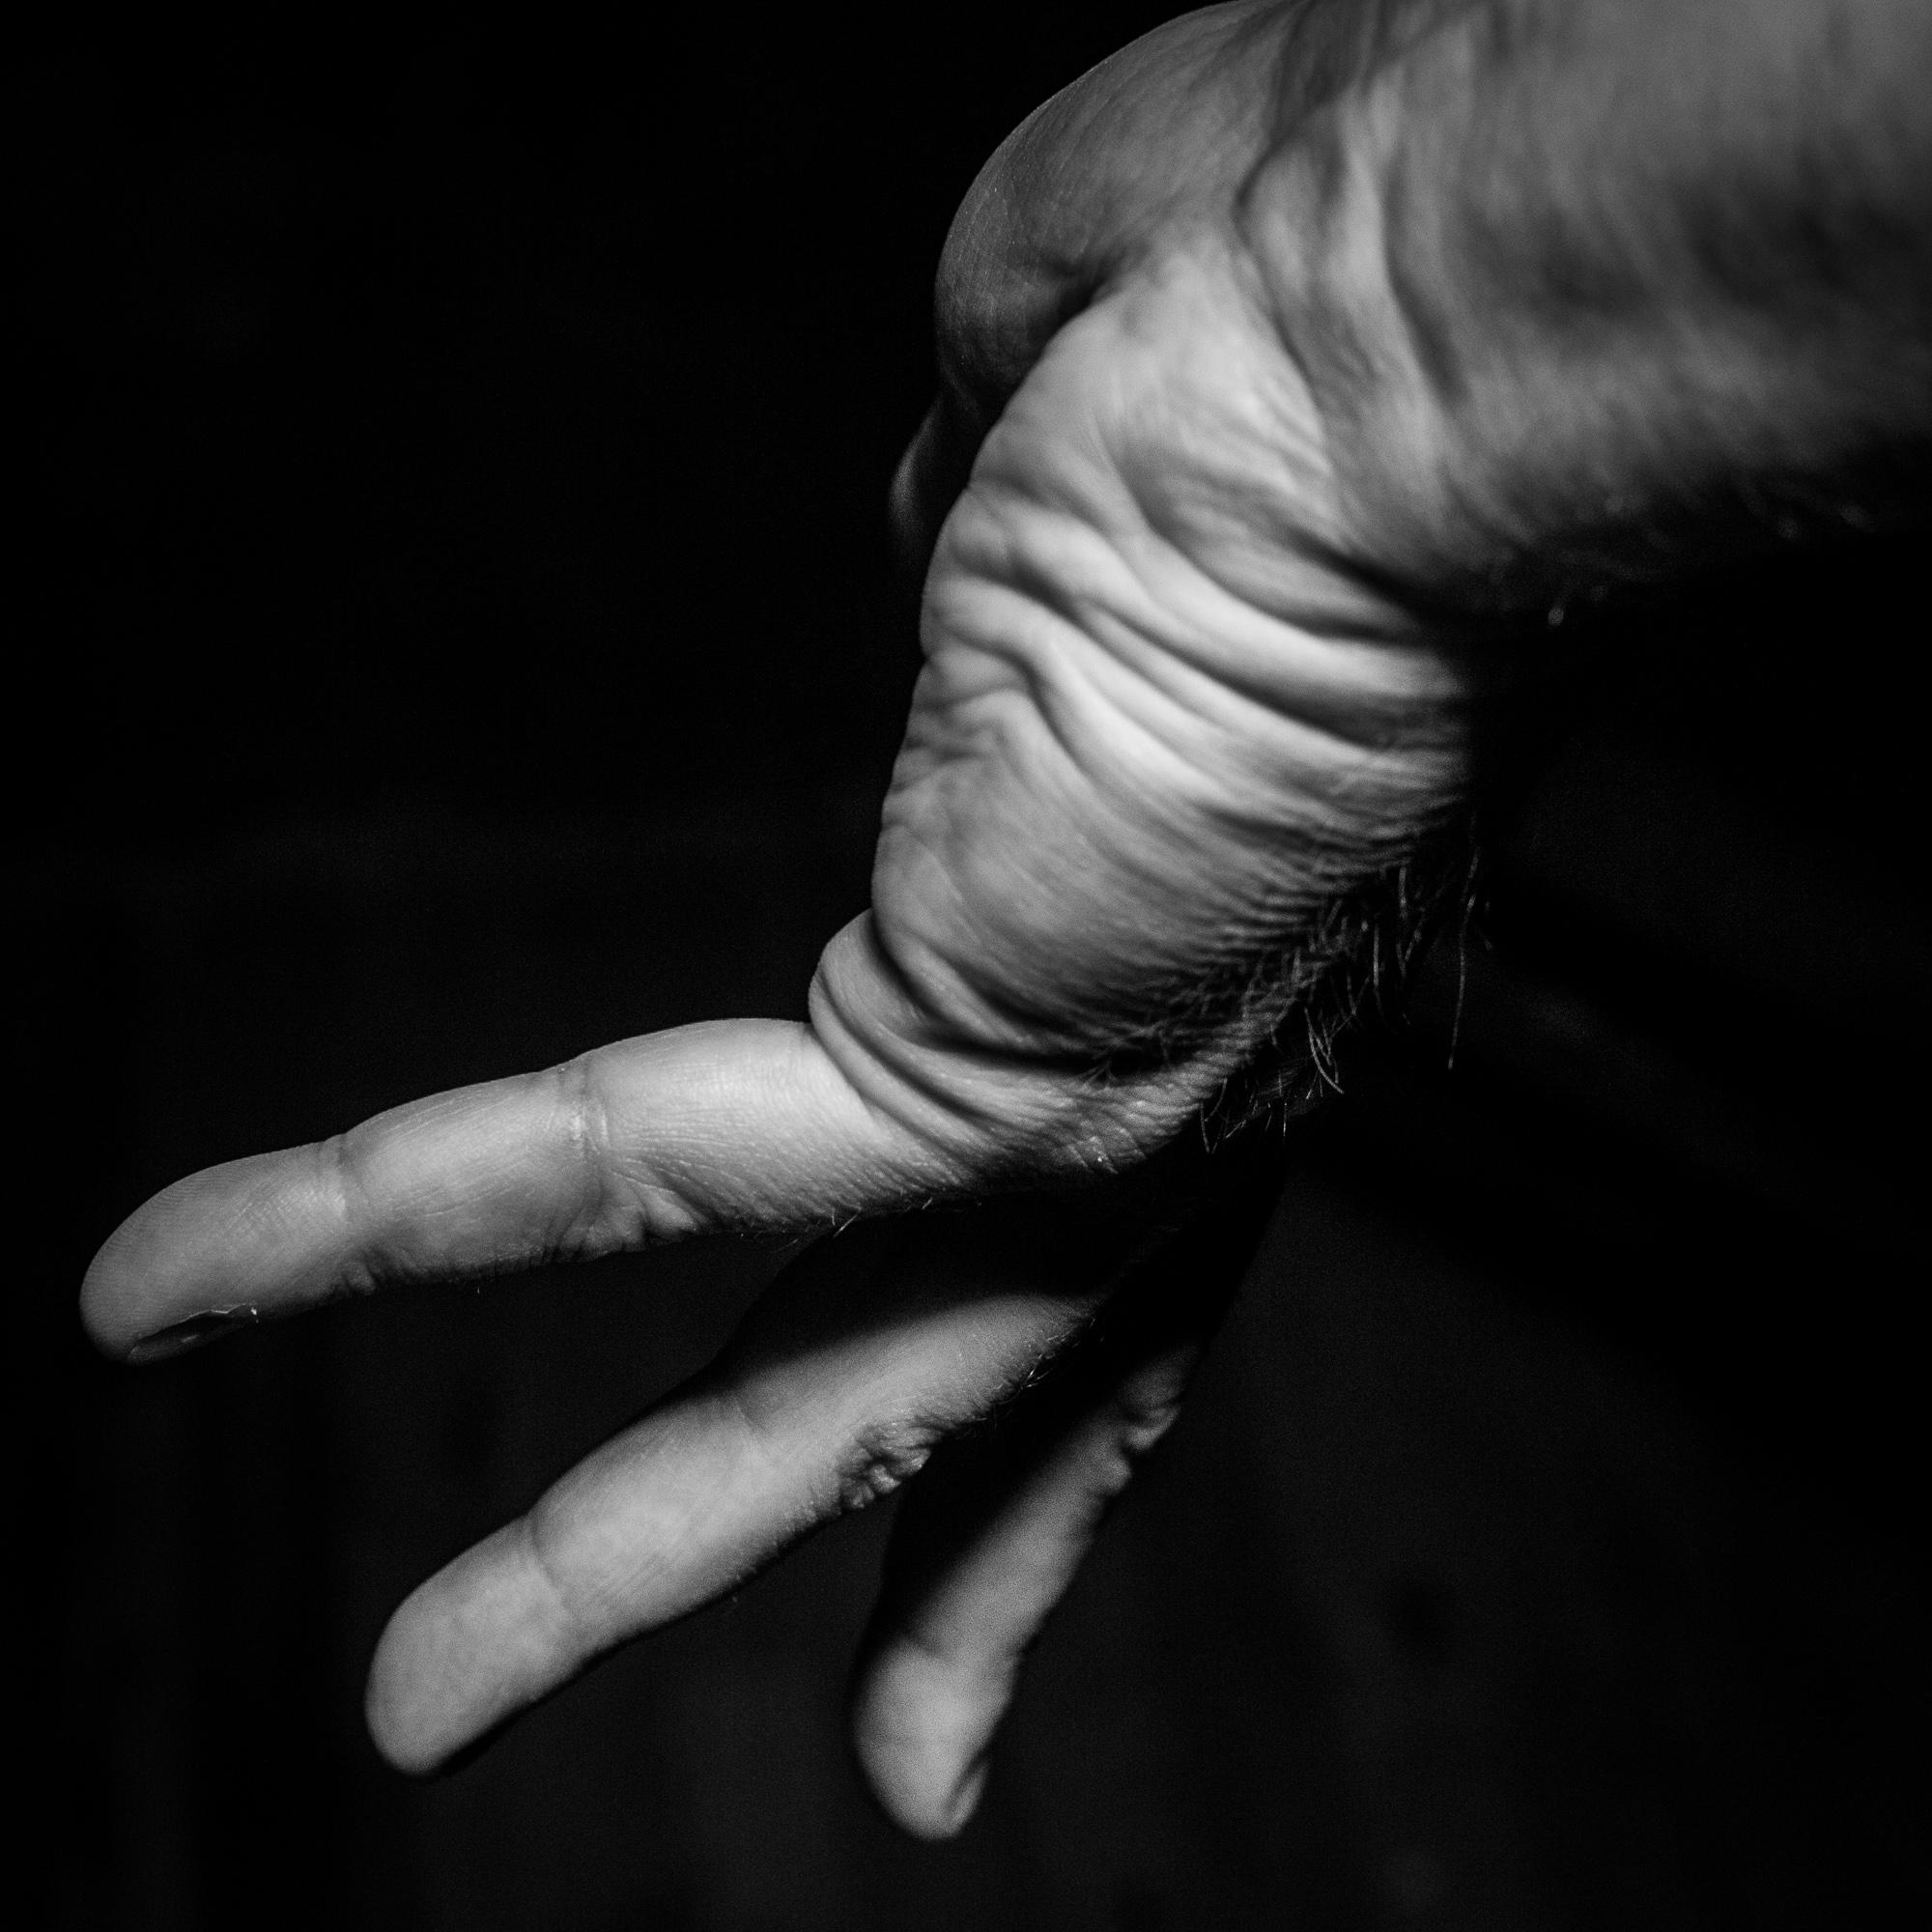 Hand29-100.jpg